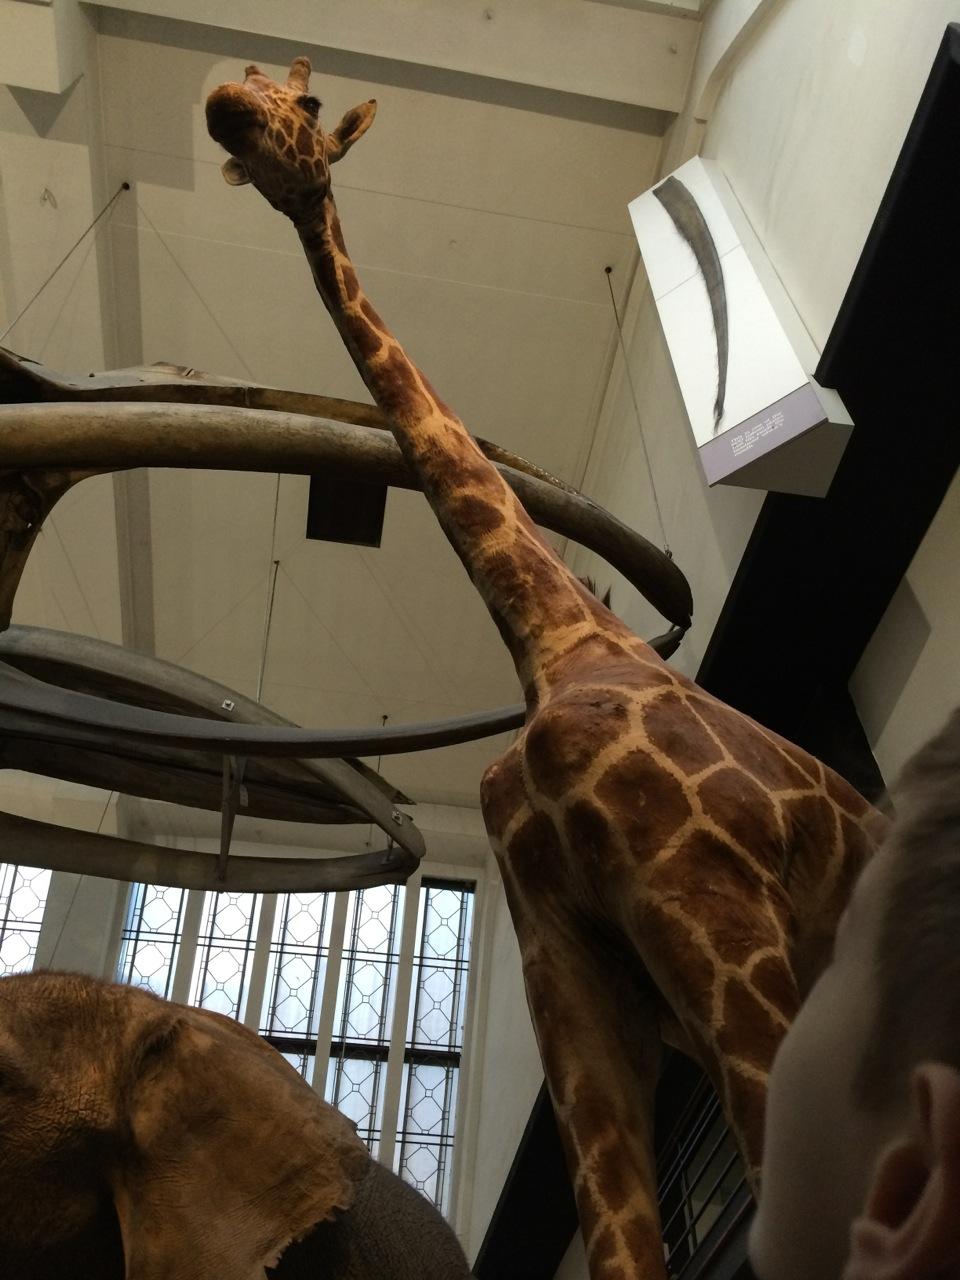 Lots of big mammals on display!